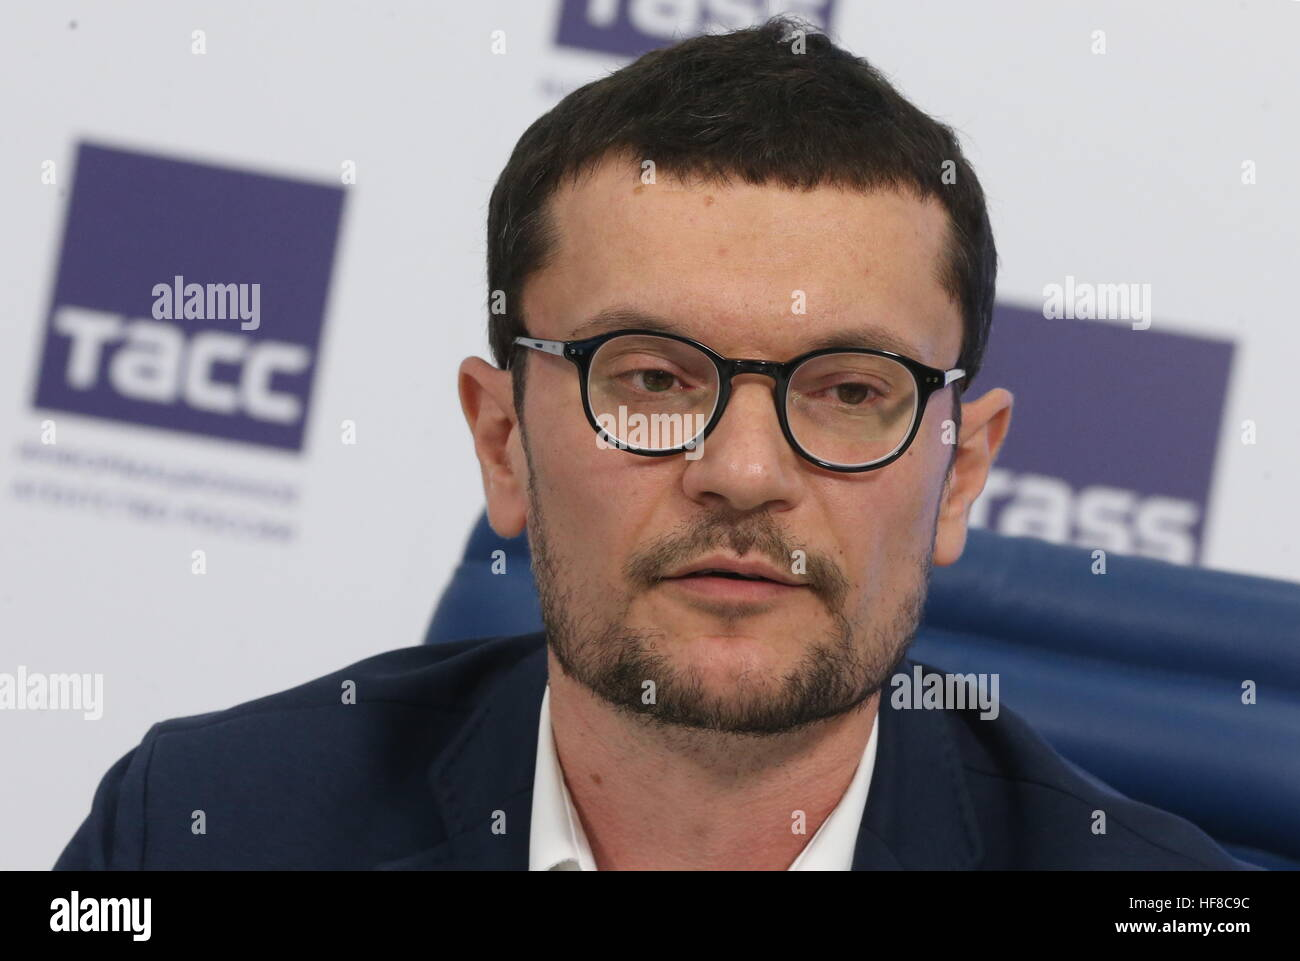 Moskau, Russland. 28. Dezember 2016. Nikolai Gudkov, Sprecher des ...